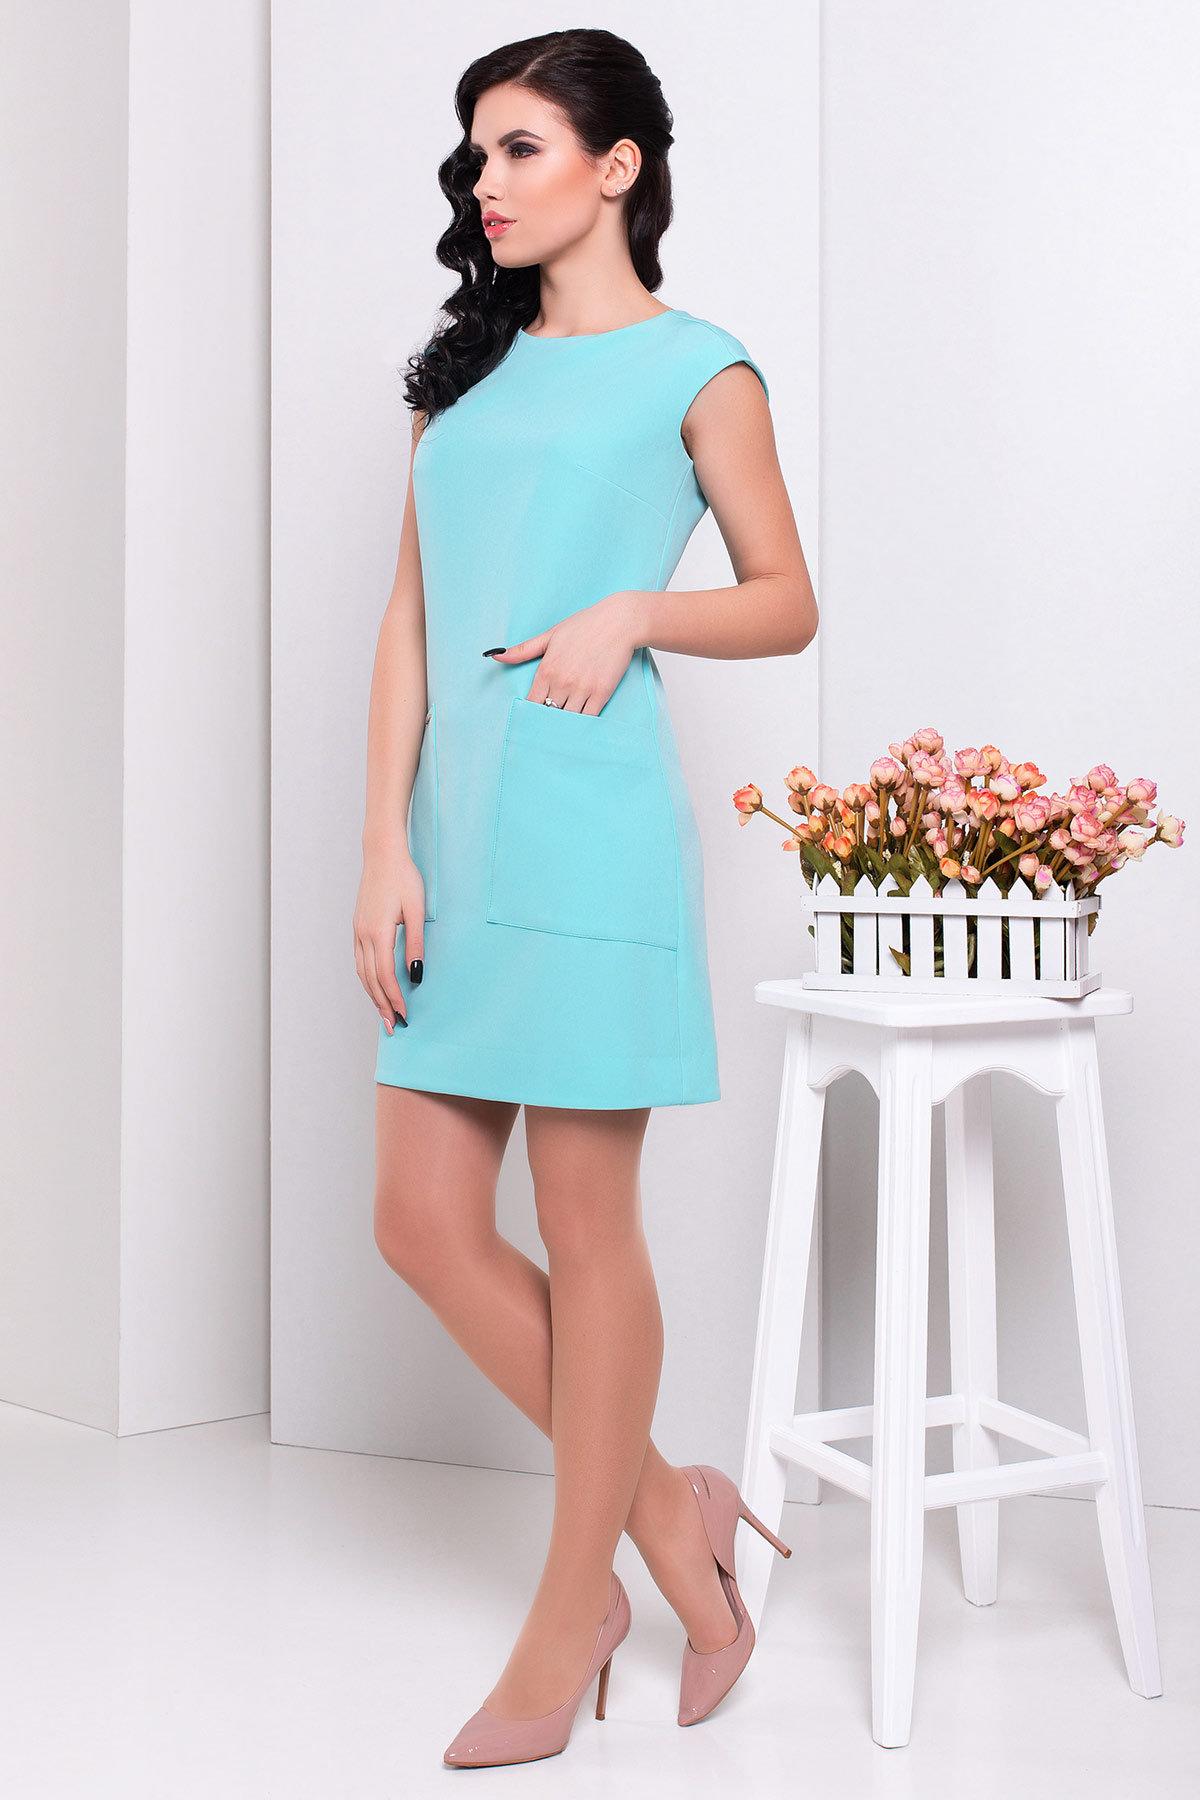 Платье Виларго лайт 270 Цвет: Мята